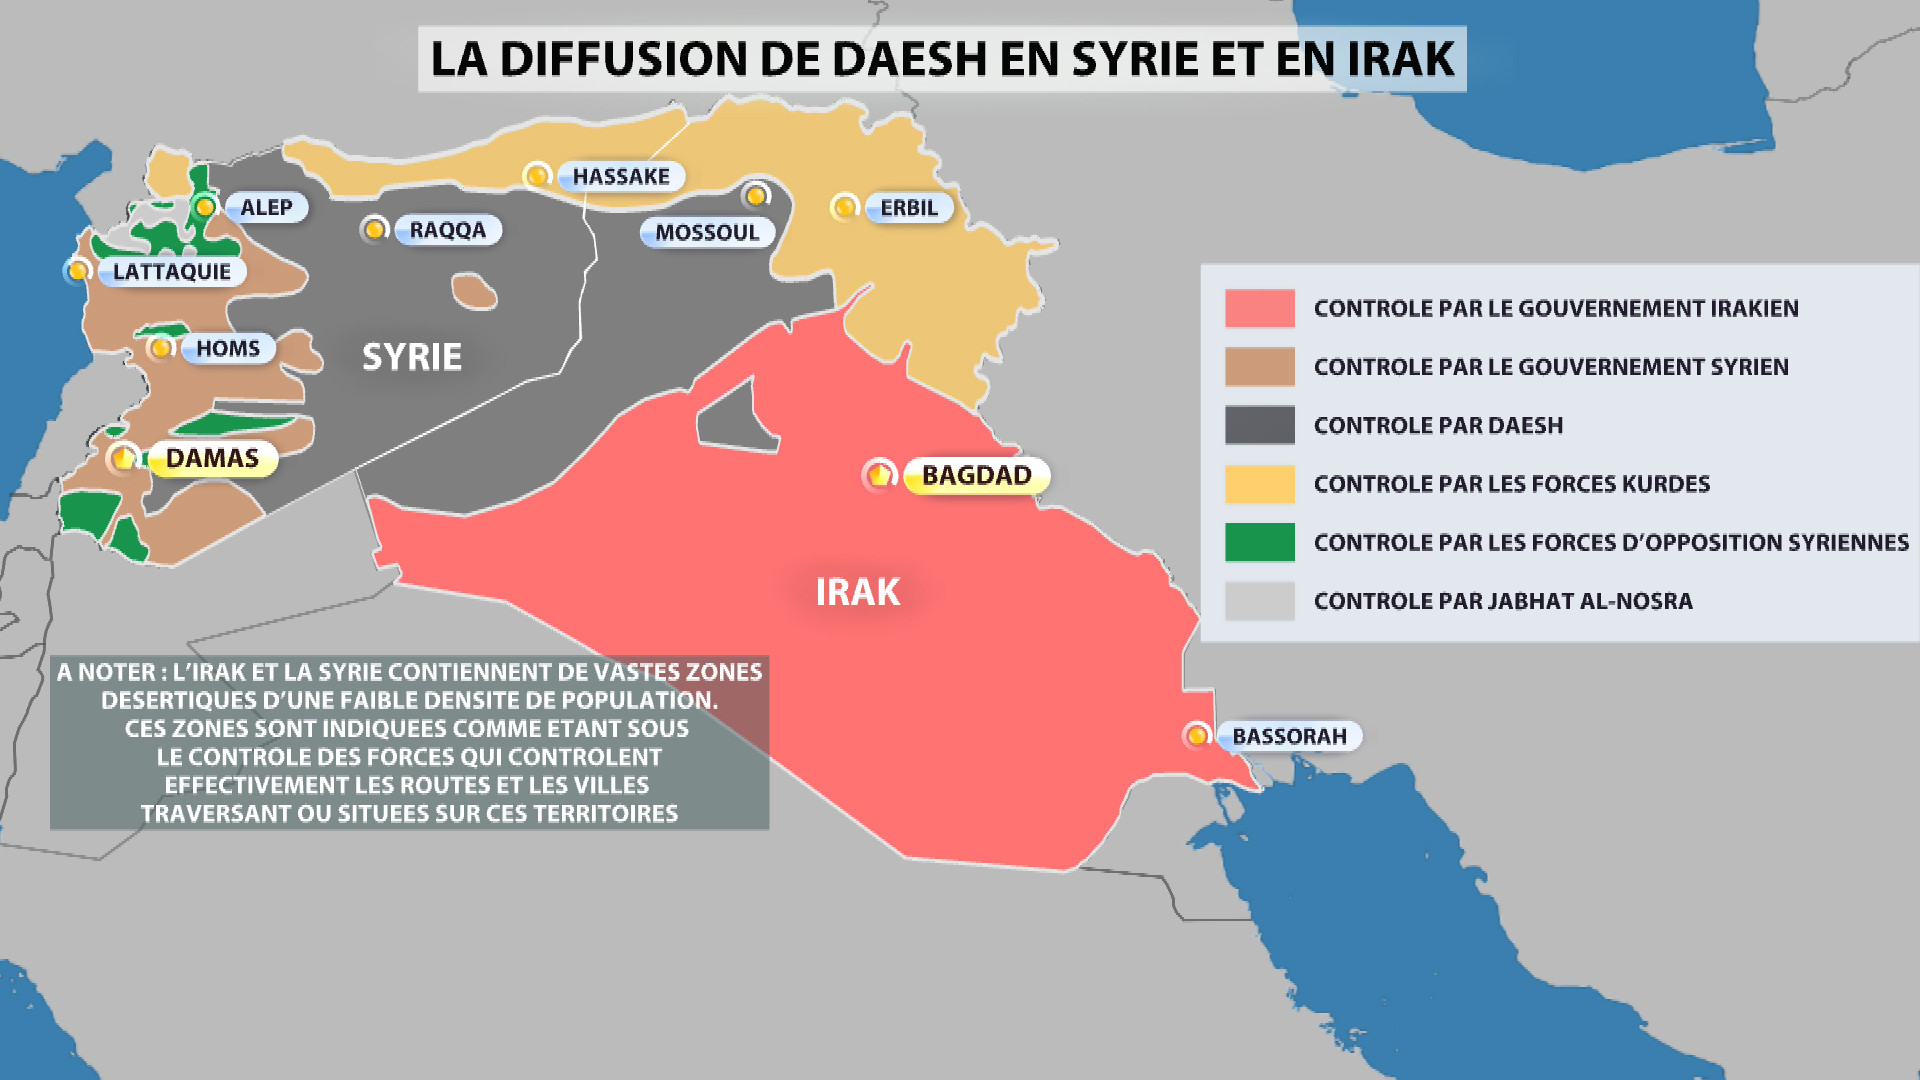 La diffusion de Daesh en Syrie et en Irak